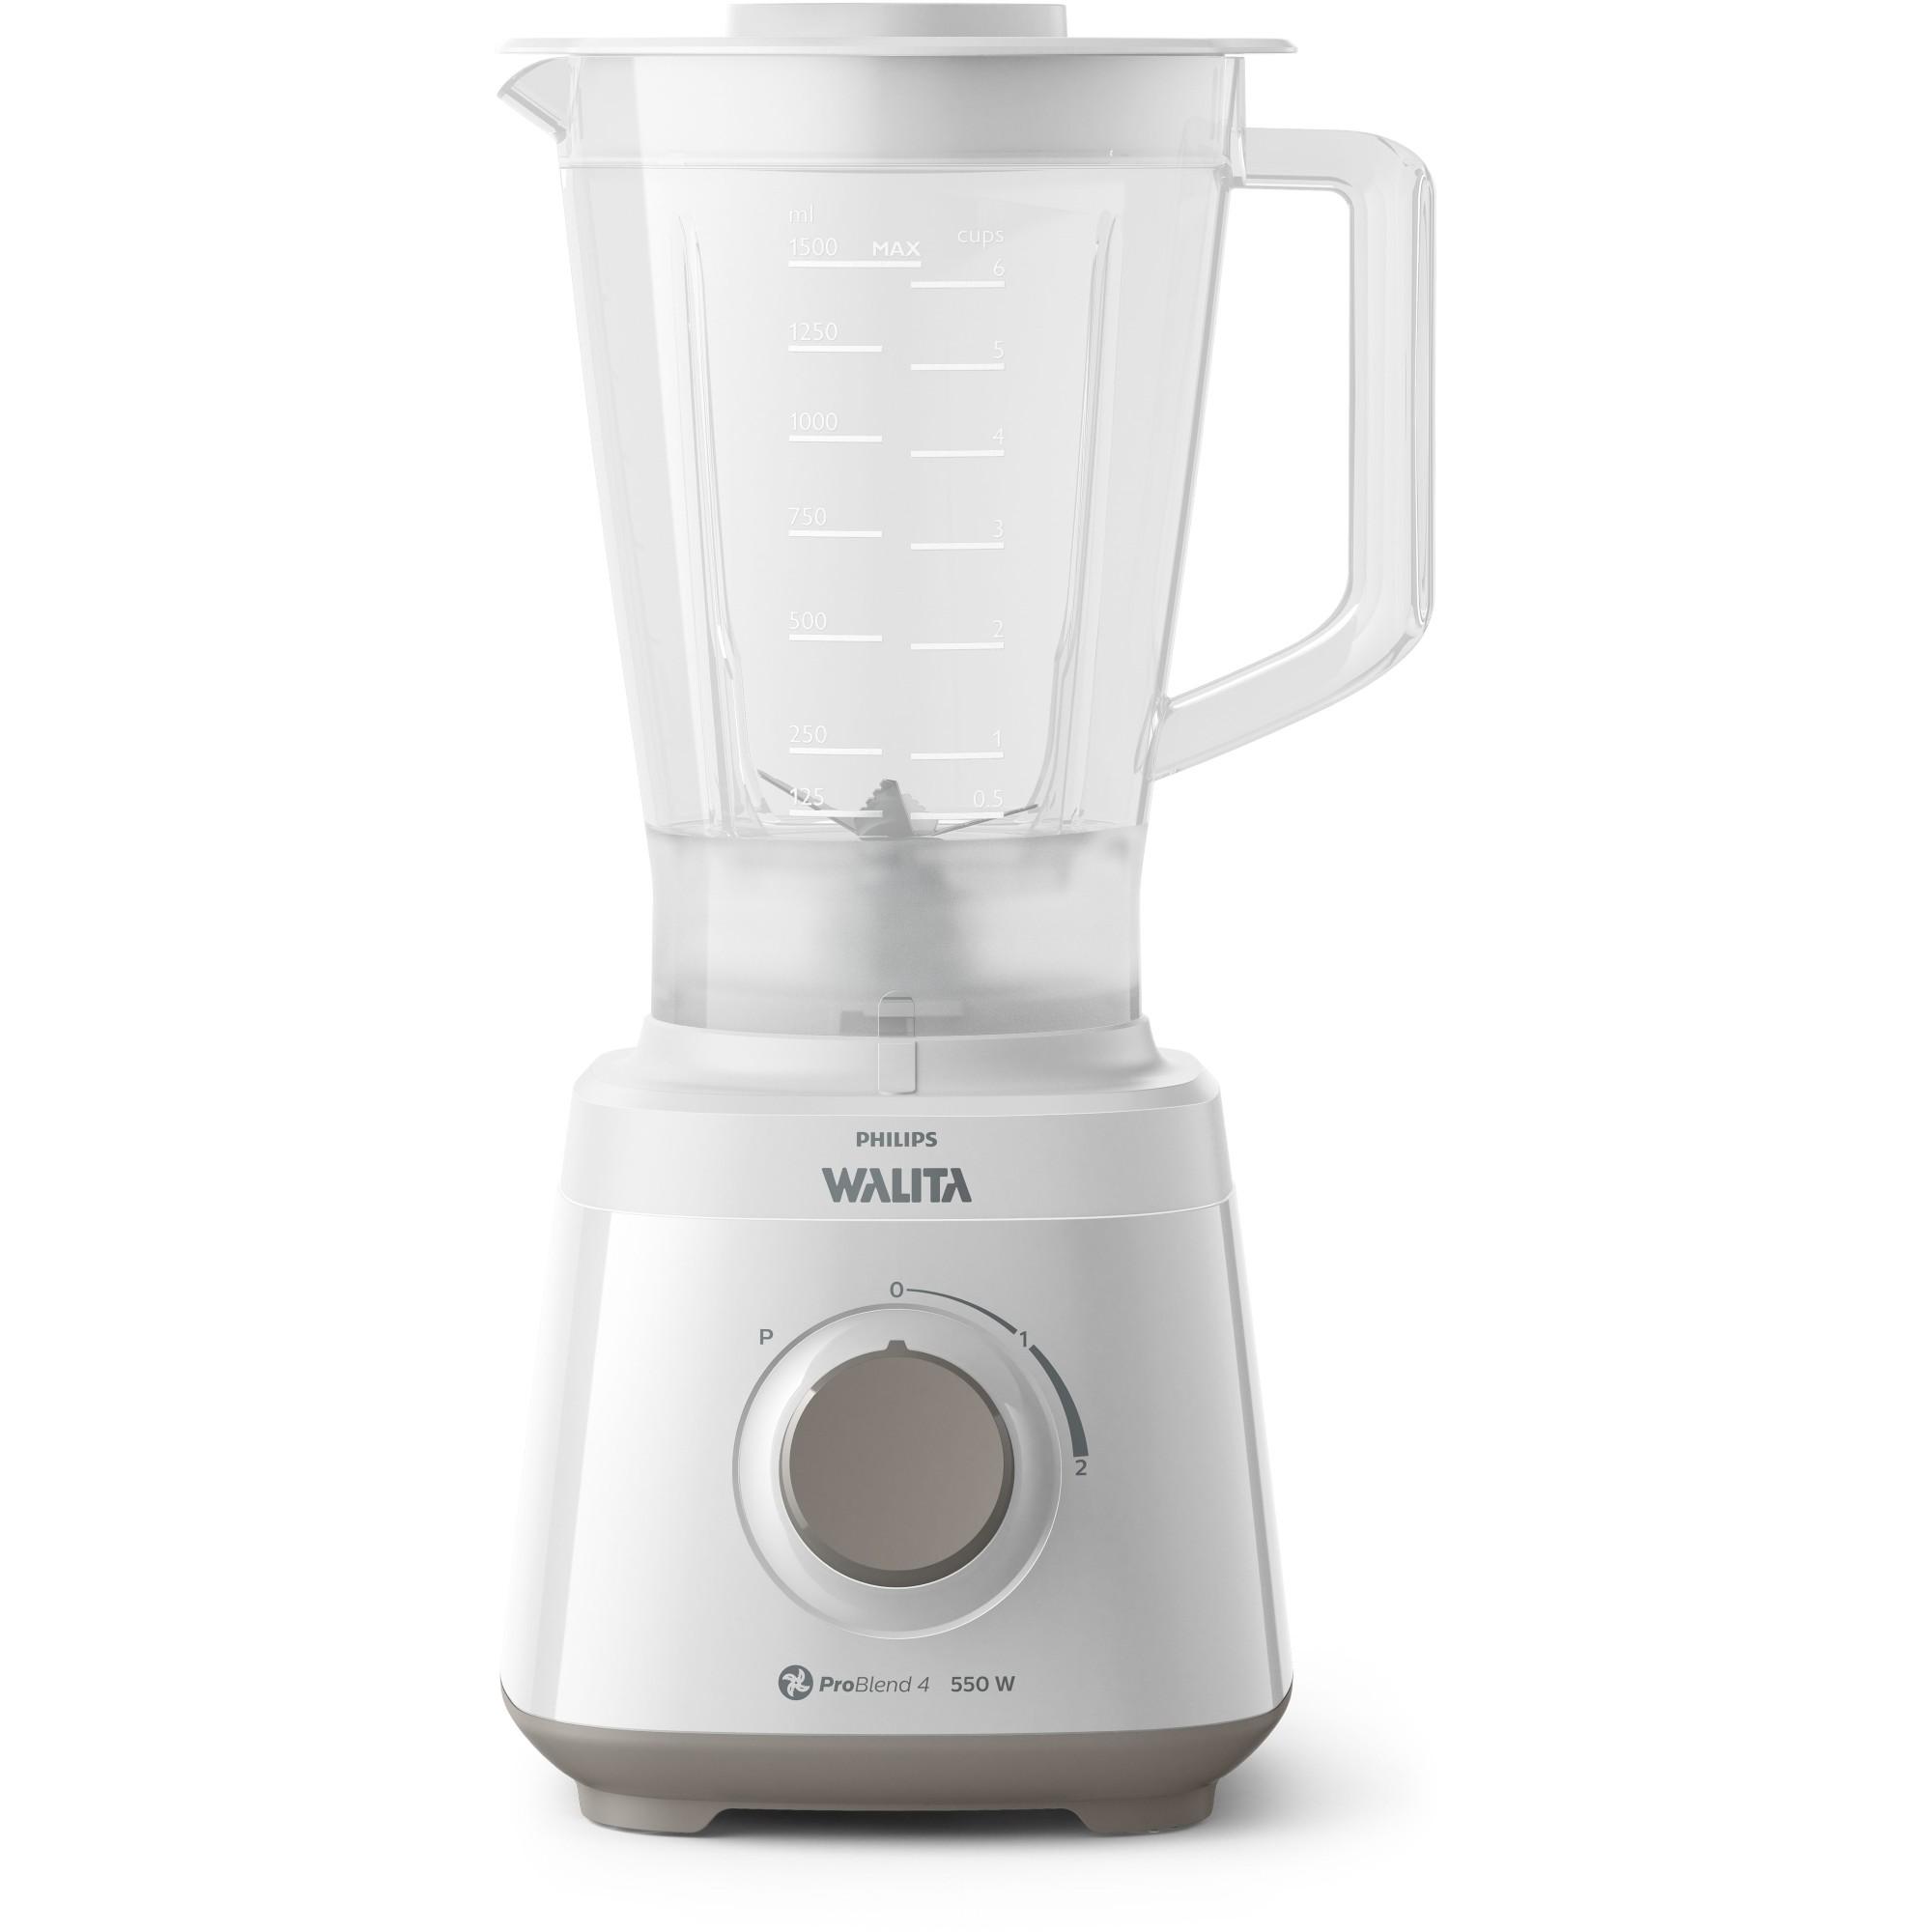 Liquidificador Philips Walita Daily Pro Blend 550W Branco 2 Velocidades 220V - RI211000